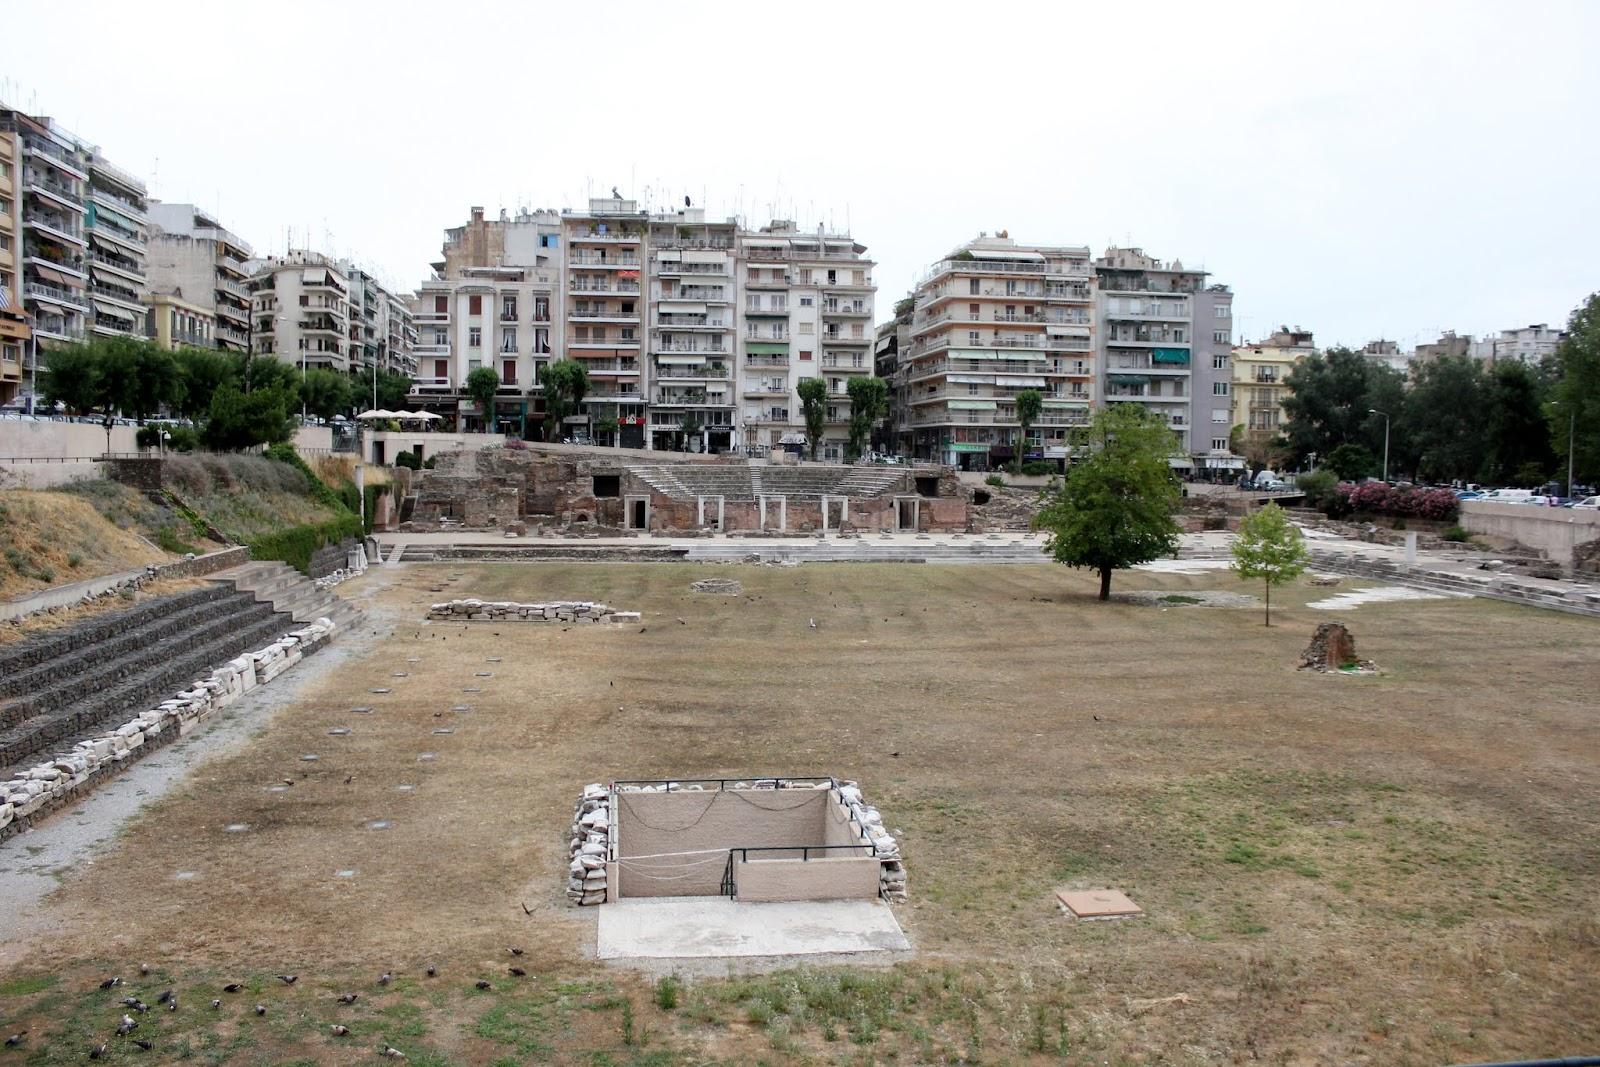 Day 19 - 2013-06-12 - Thessaloniki - IMG_0382.JPG